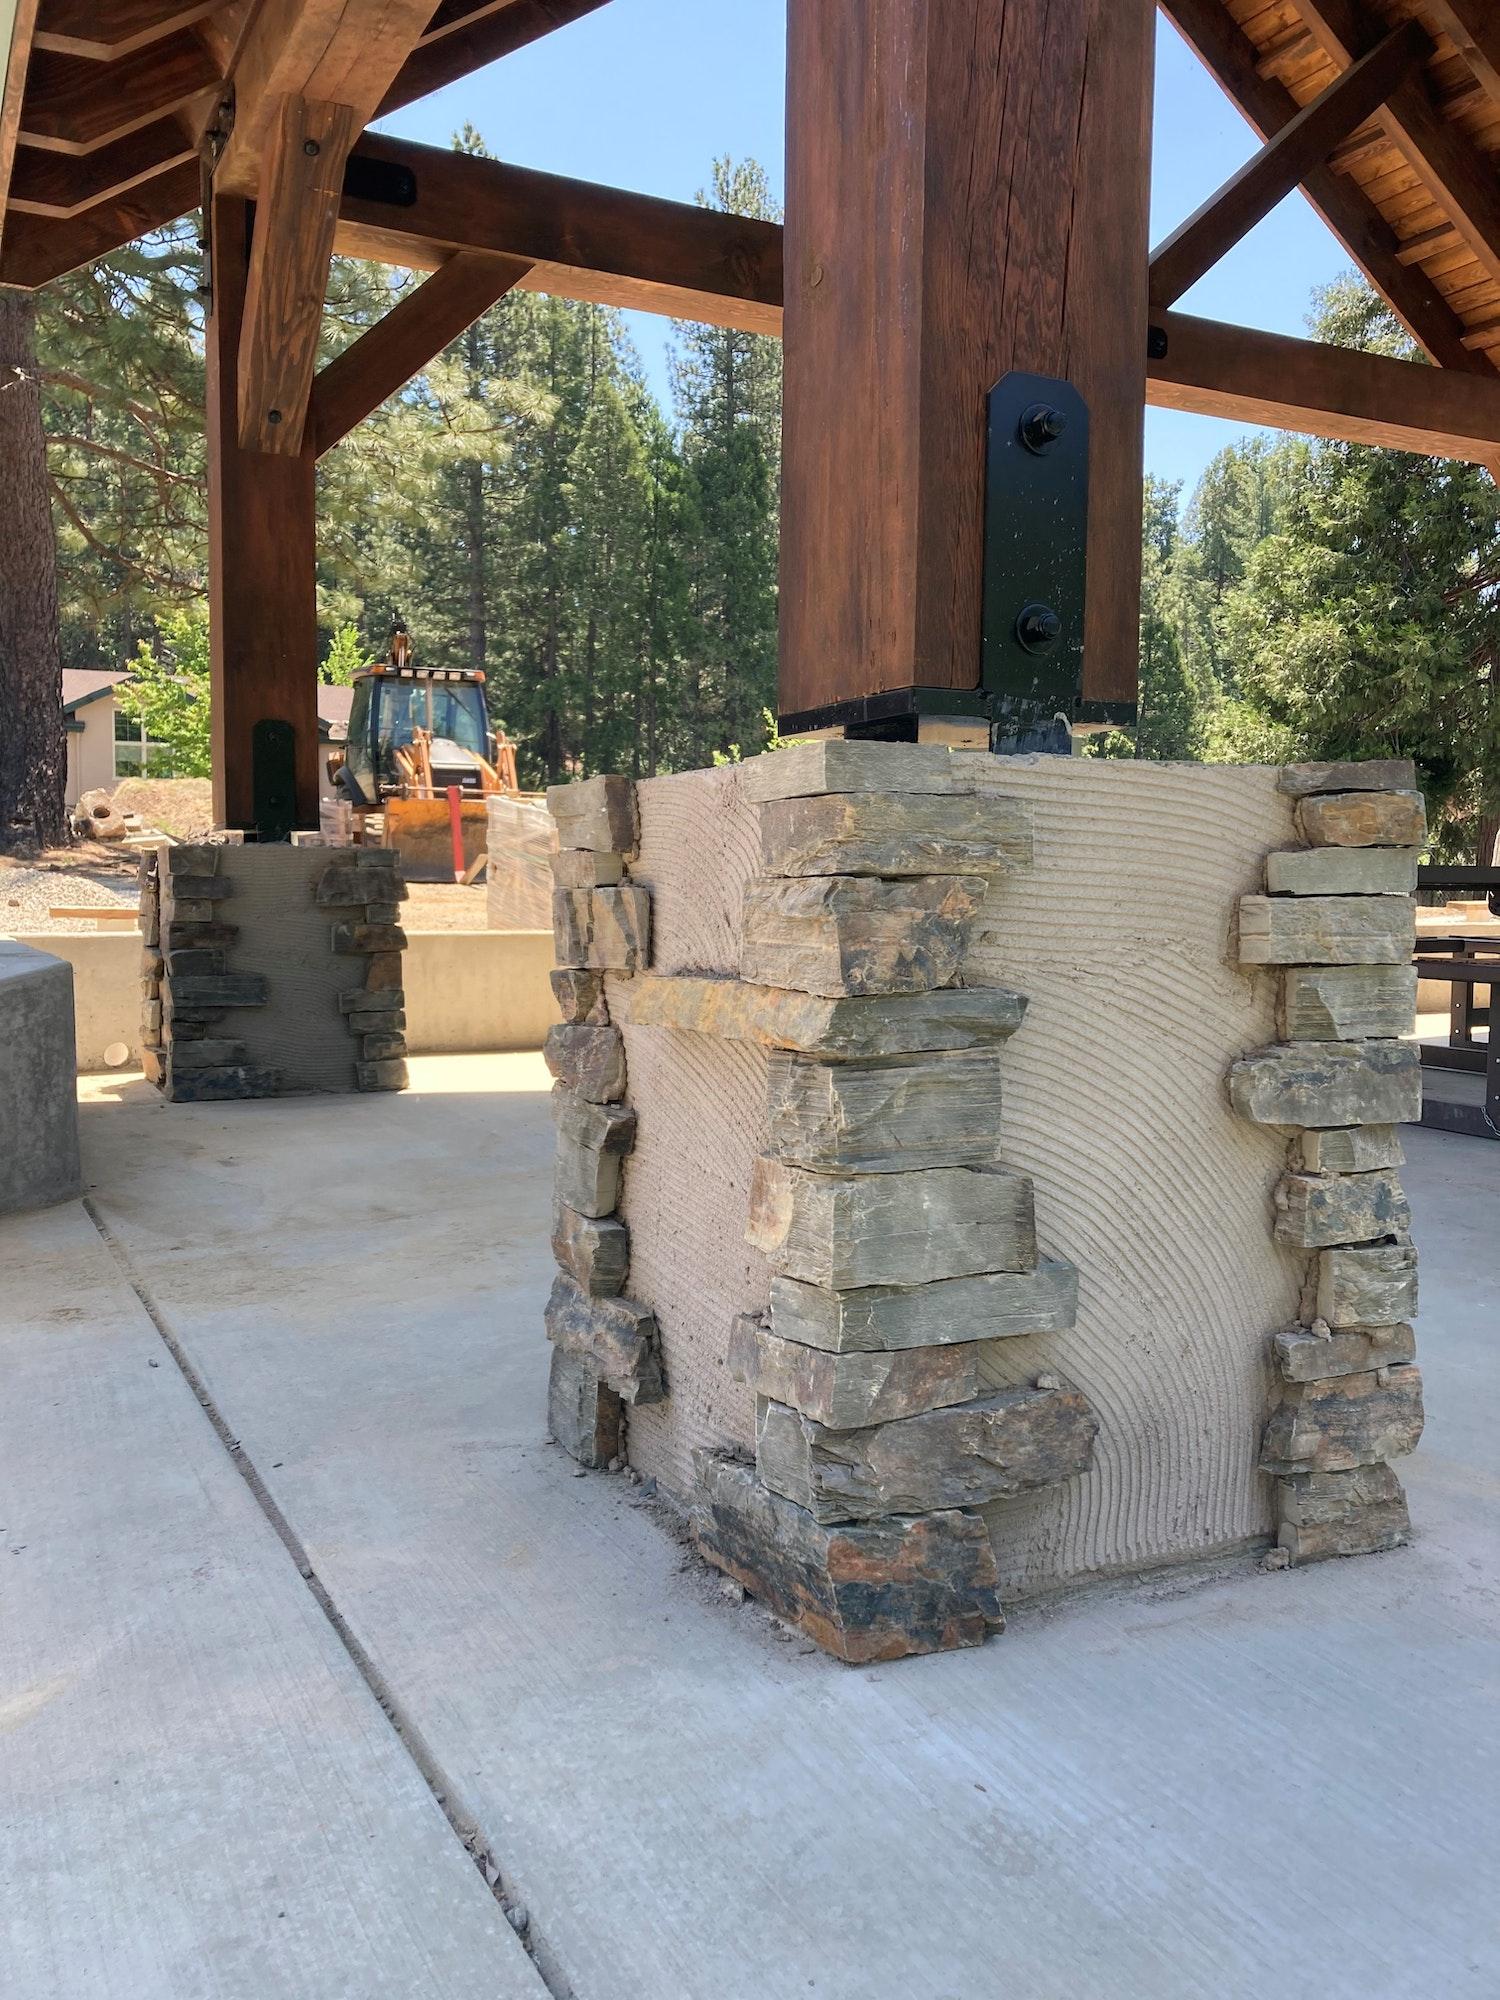 May contain: patio, flagstone, porch, pergola, and slate